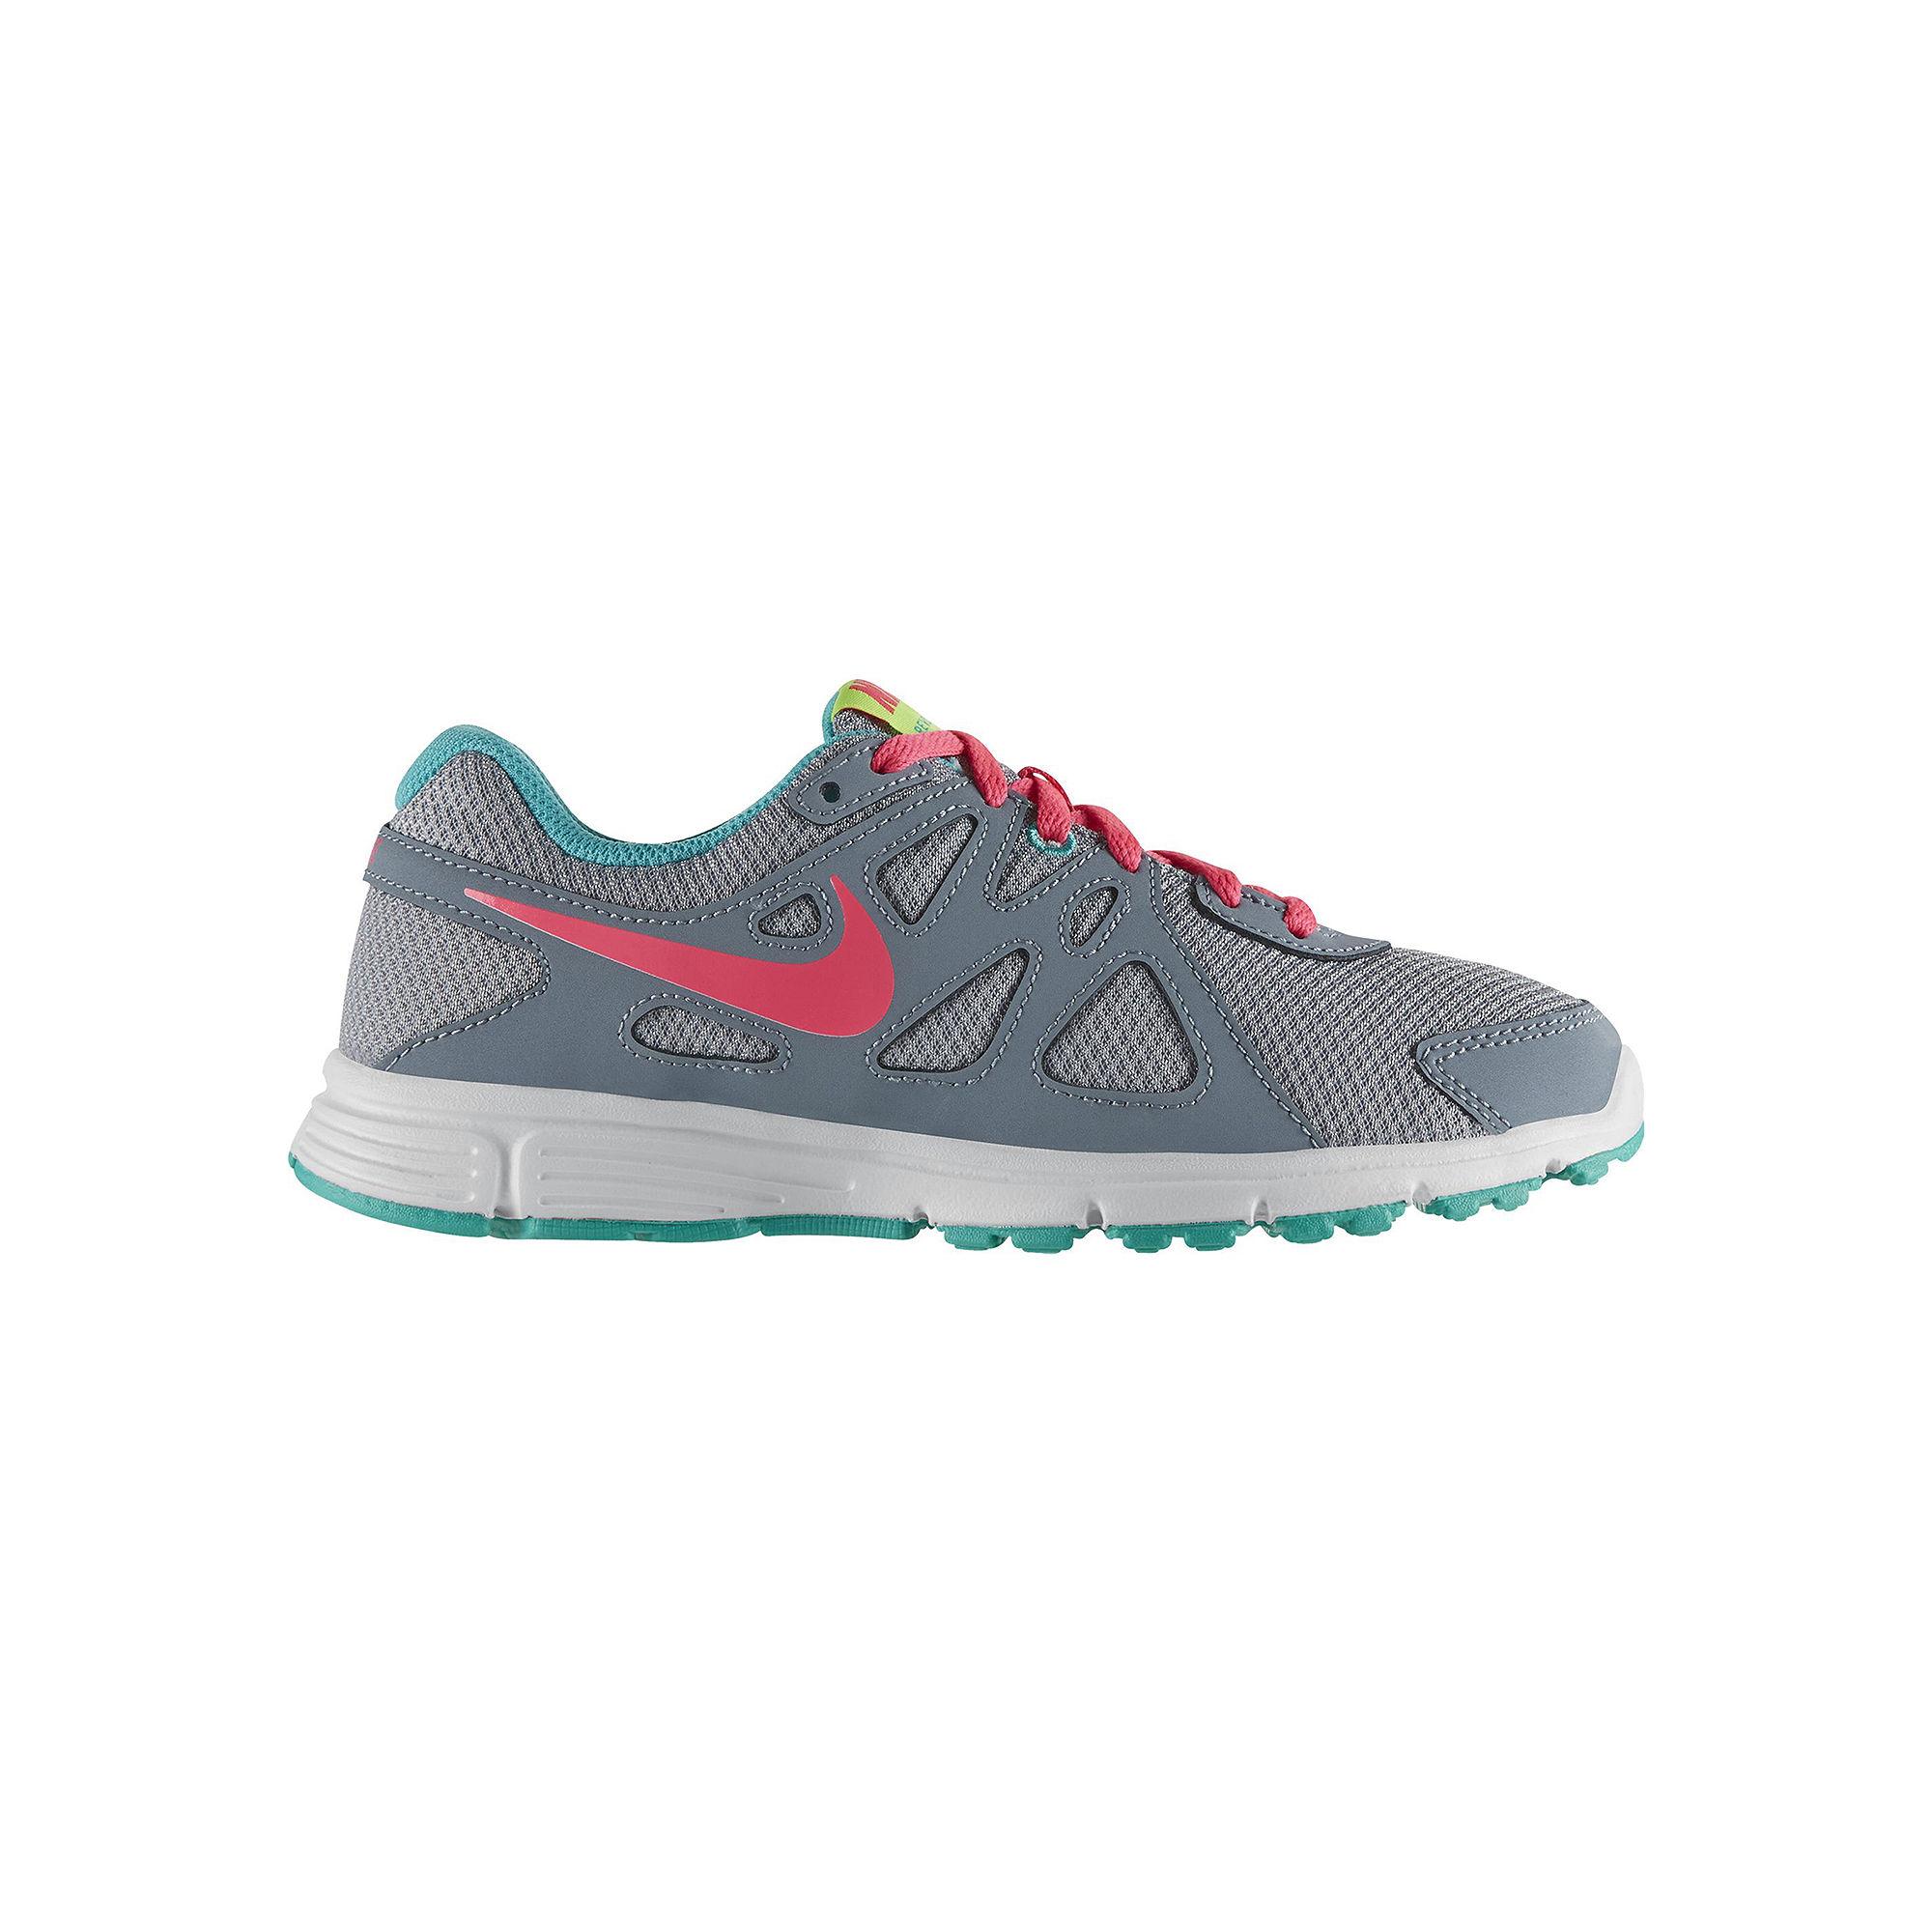 19033c684e ... UPC 884497565446 product image for Nike Revolution 2 Girls Athletic  Shoes - Big Kids   upcitemdb ...